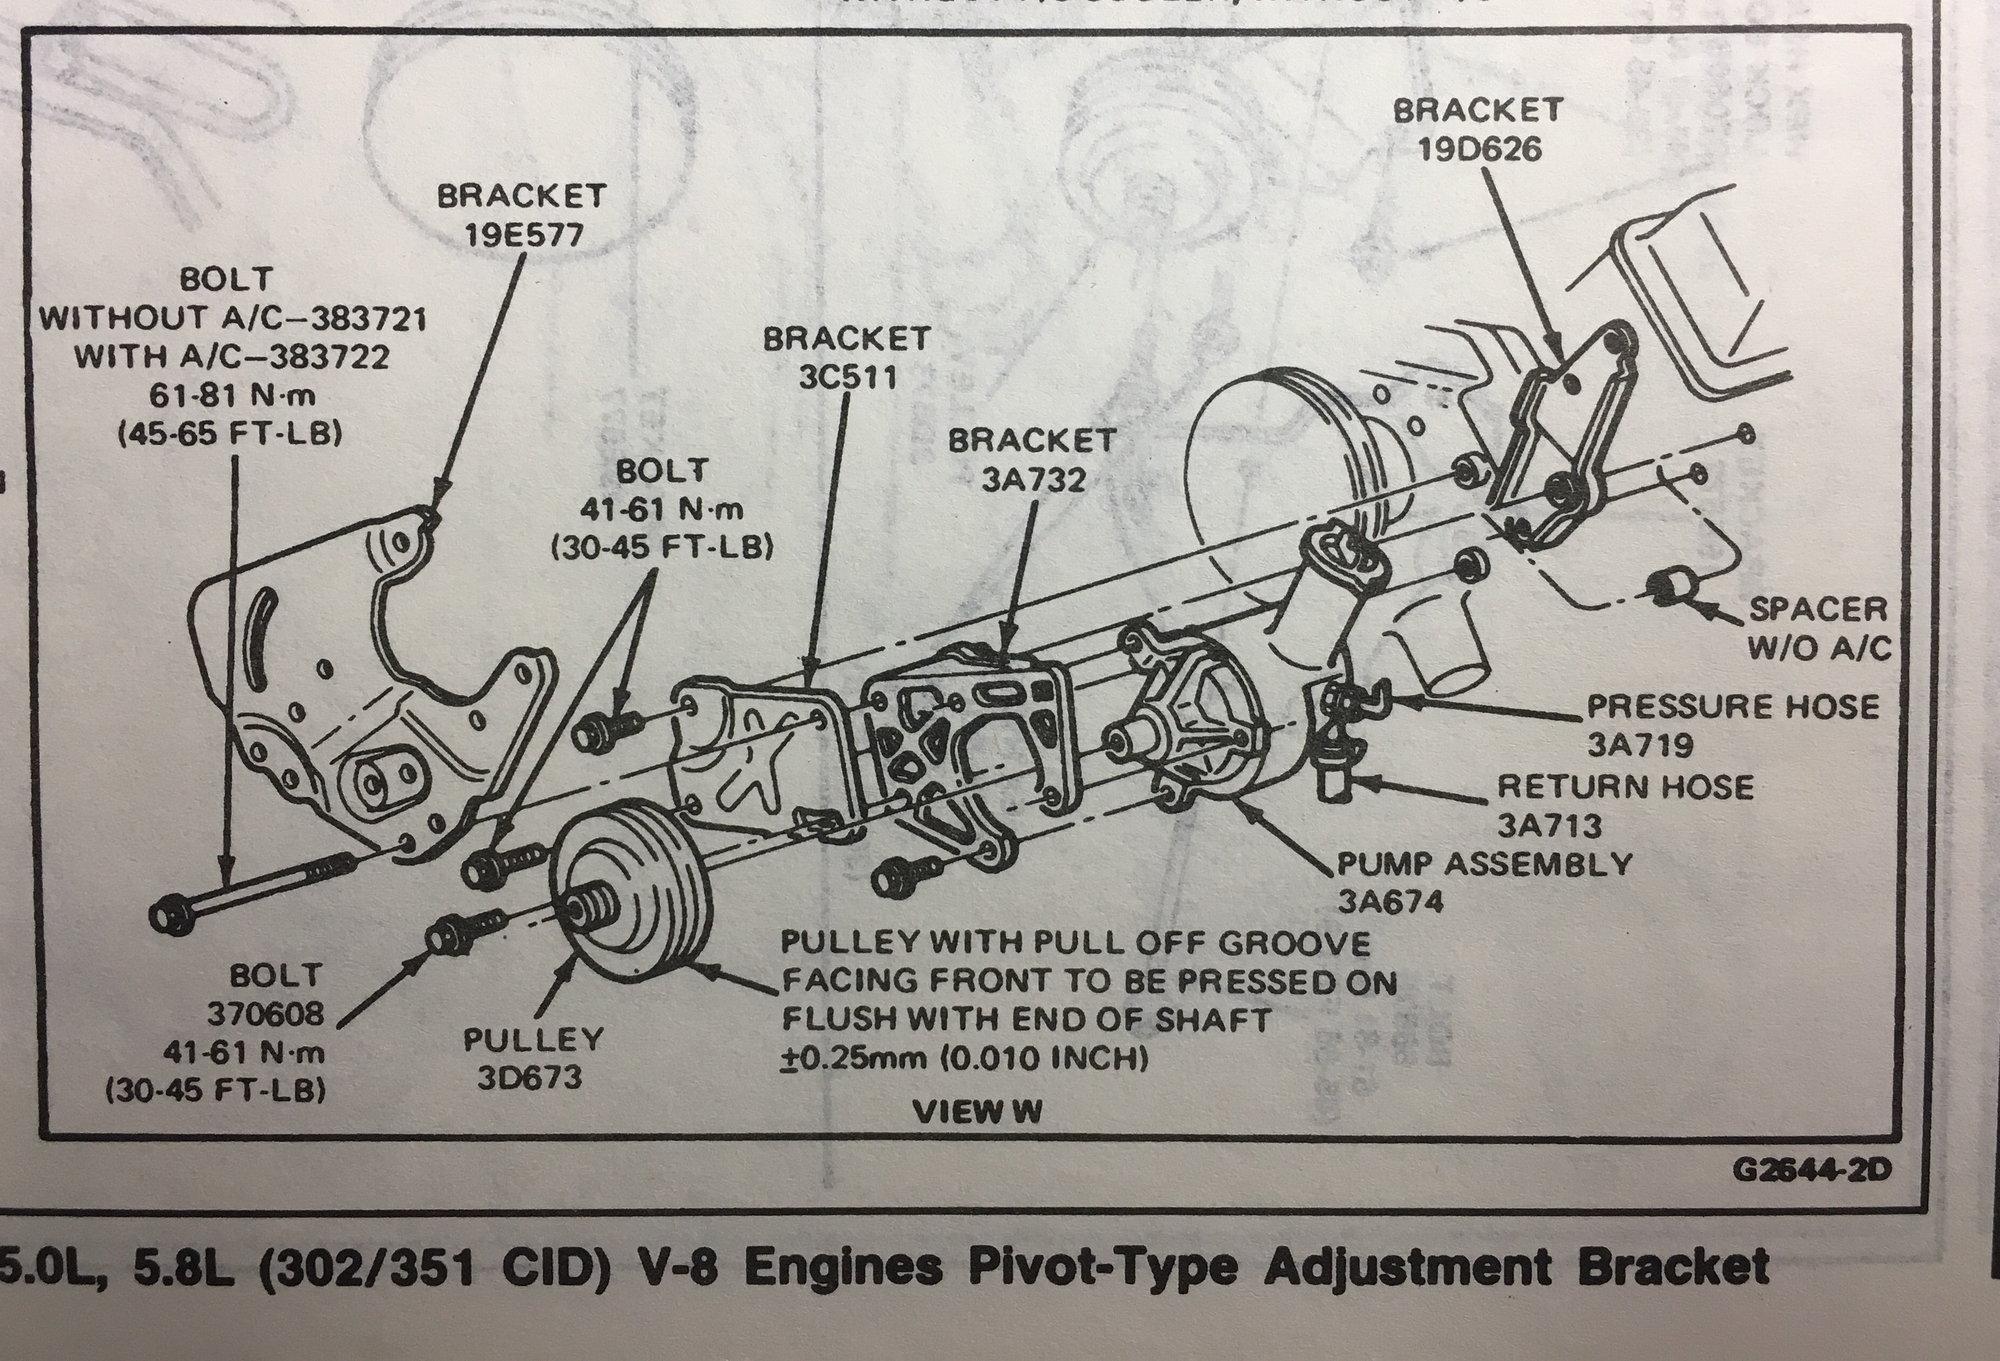 1986 Ford F 150 302 Engine Bracket Diagram Wiring Diagram Ultimate2 Ultimate2 Musikami It